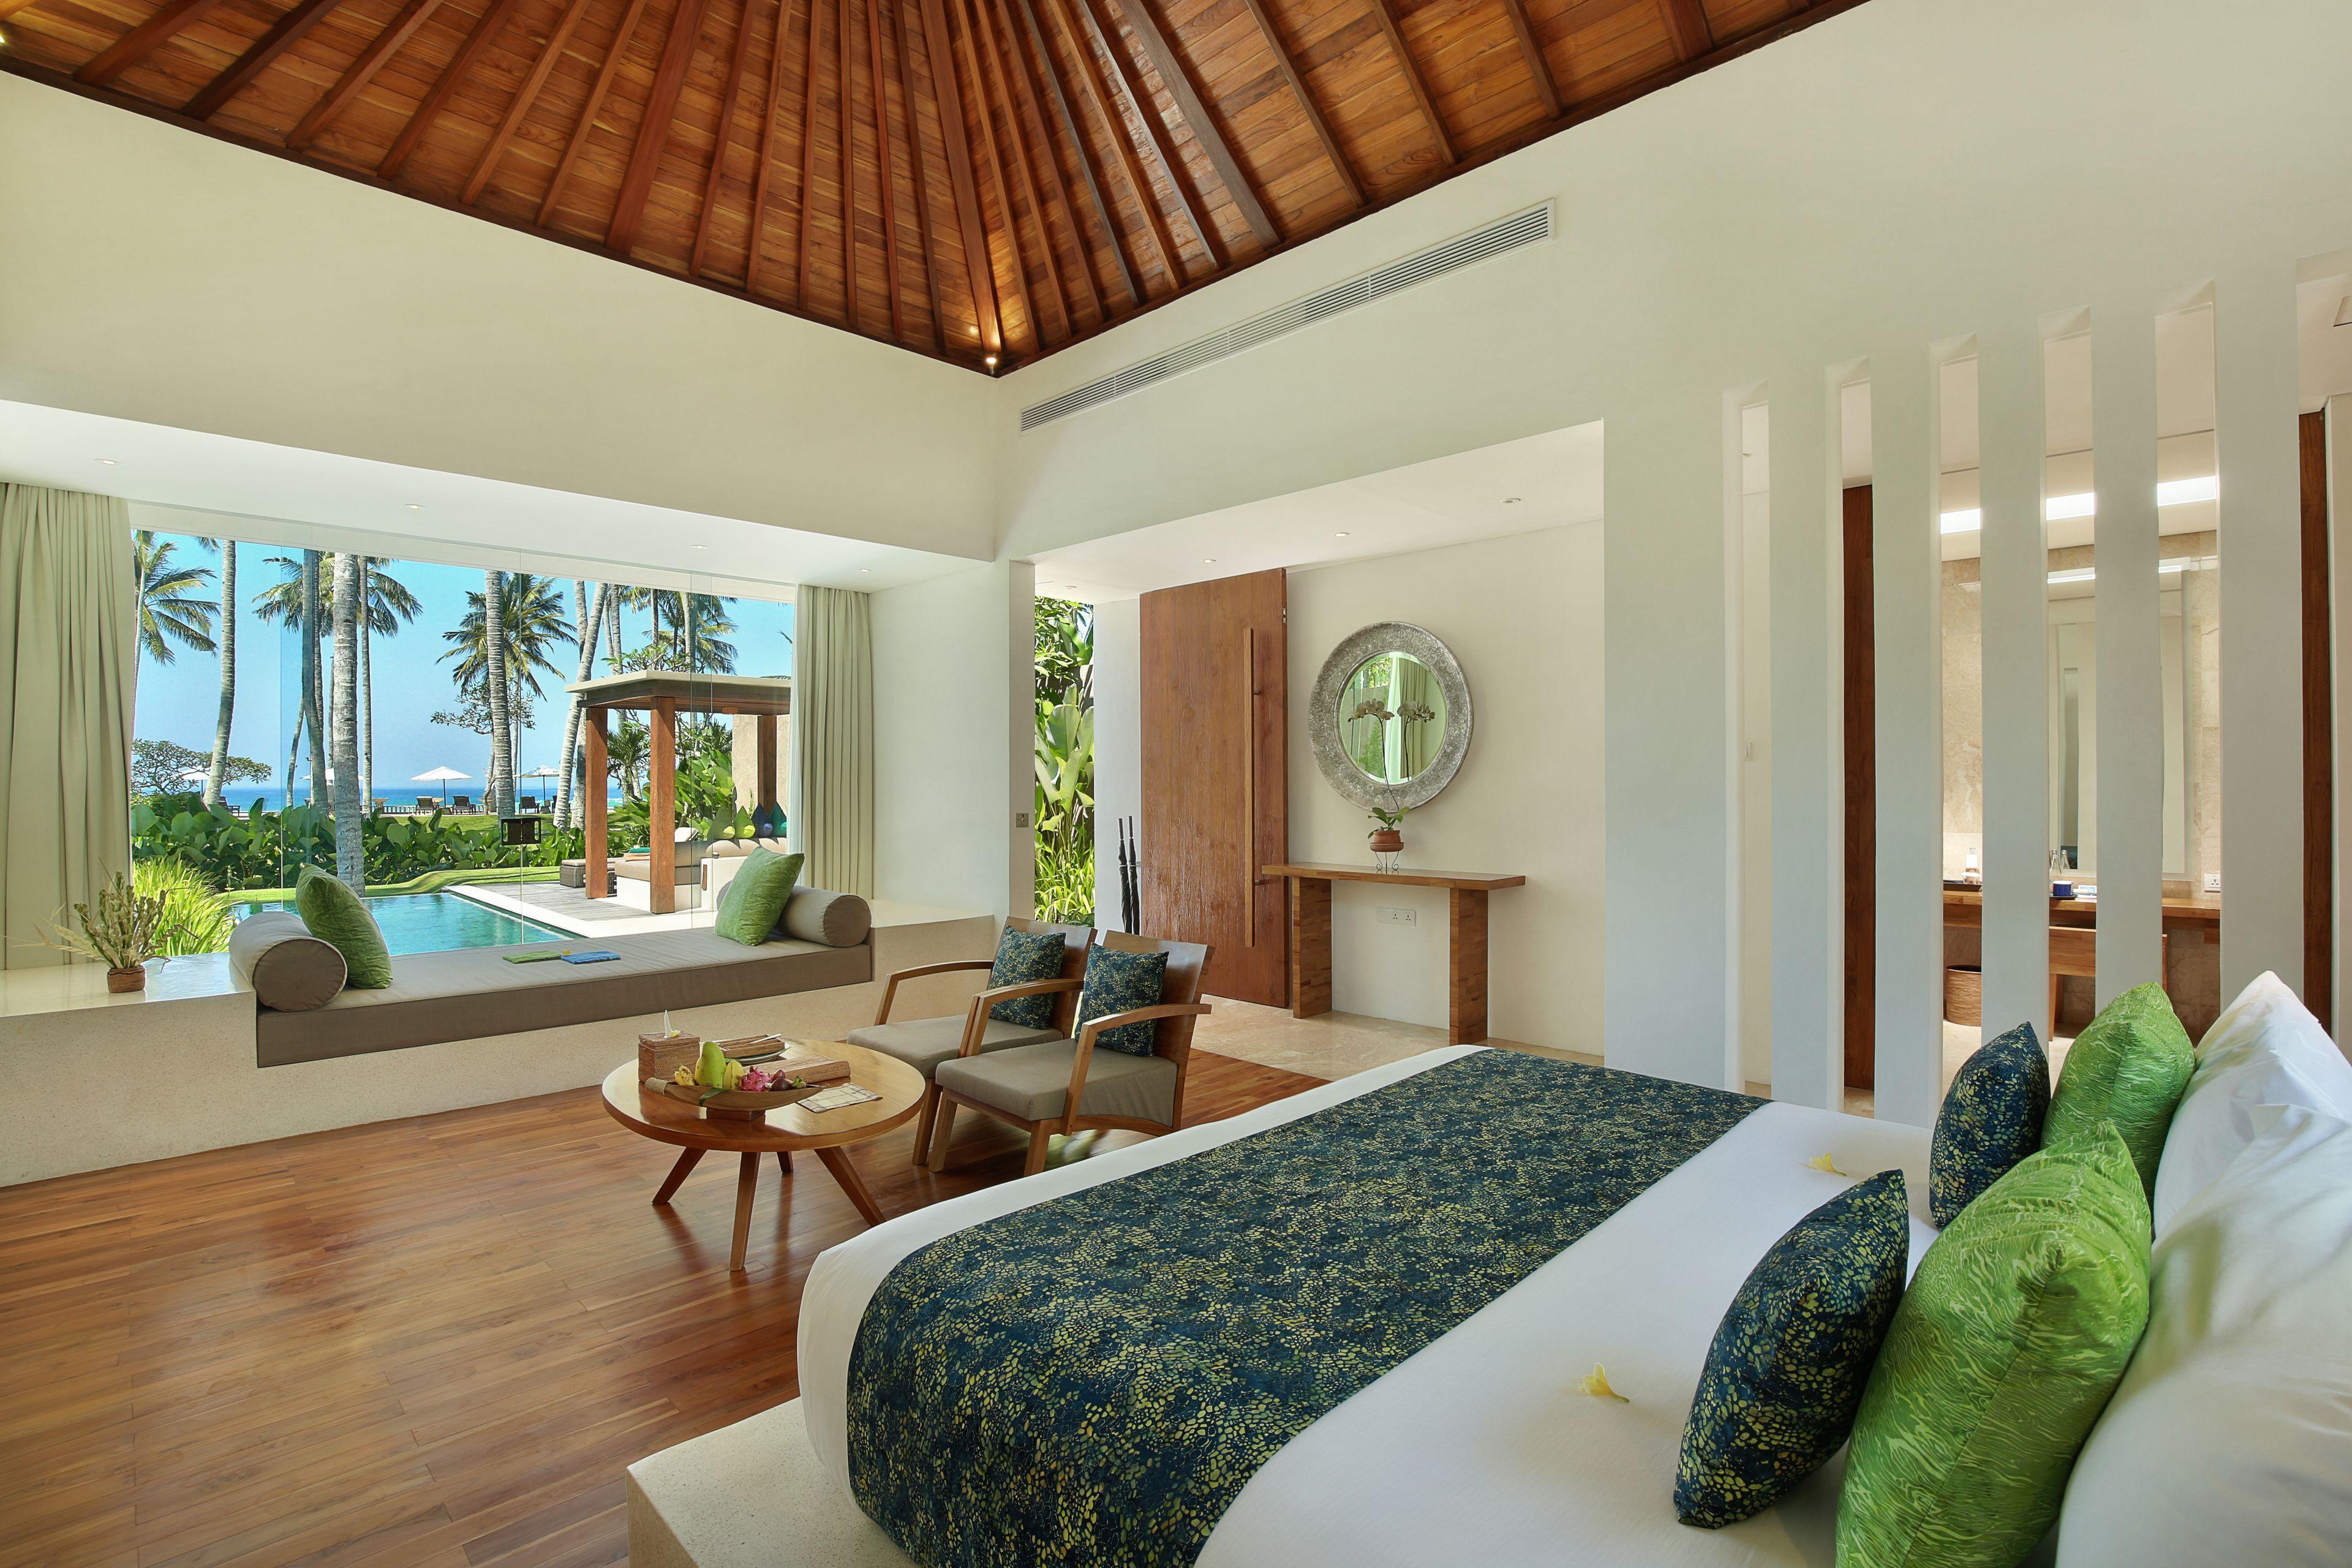 Courtesy of Candi Beach Resort and Spa / Expedia.com